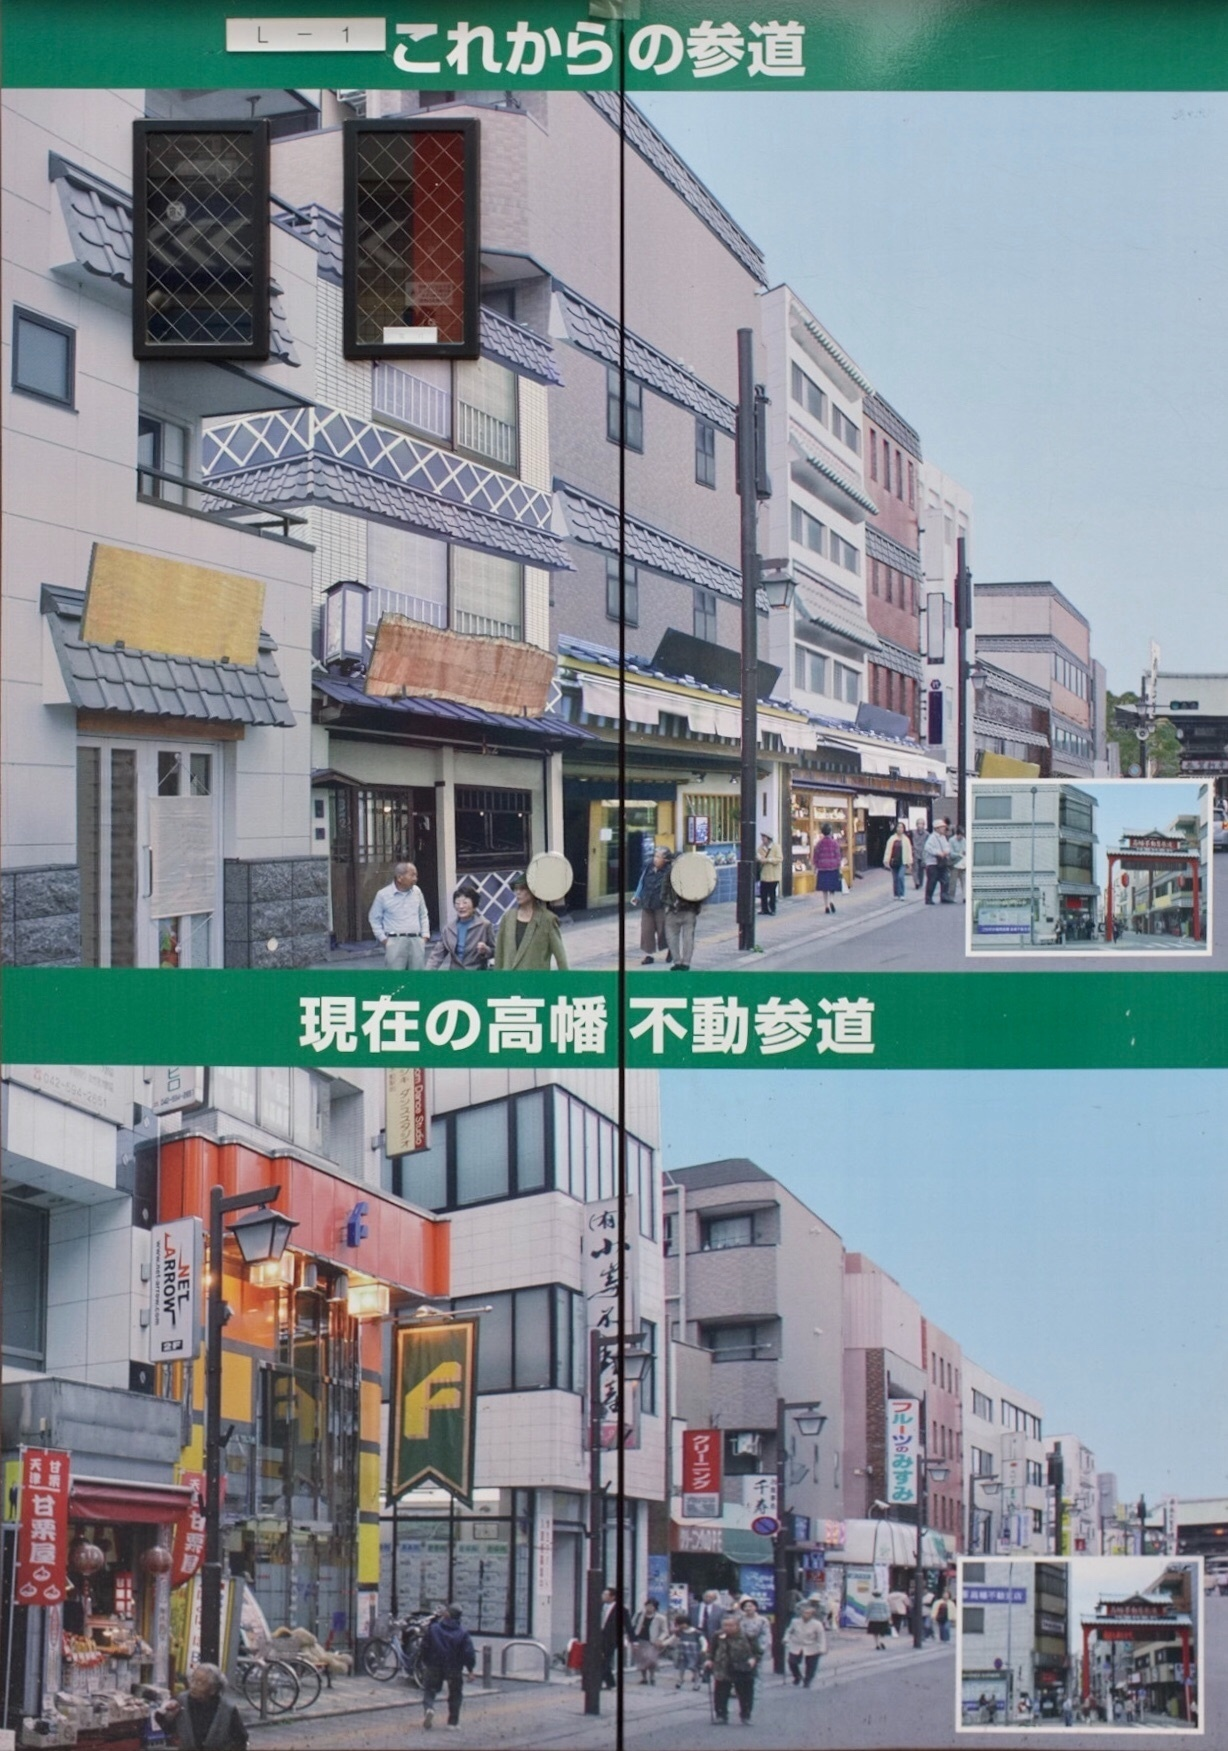 f:id:Yamadamado:20200914074513j:image